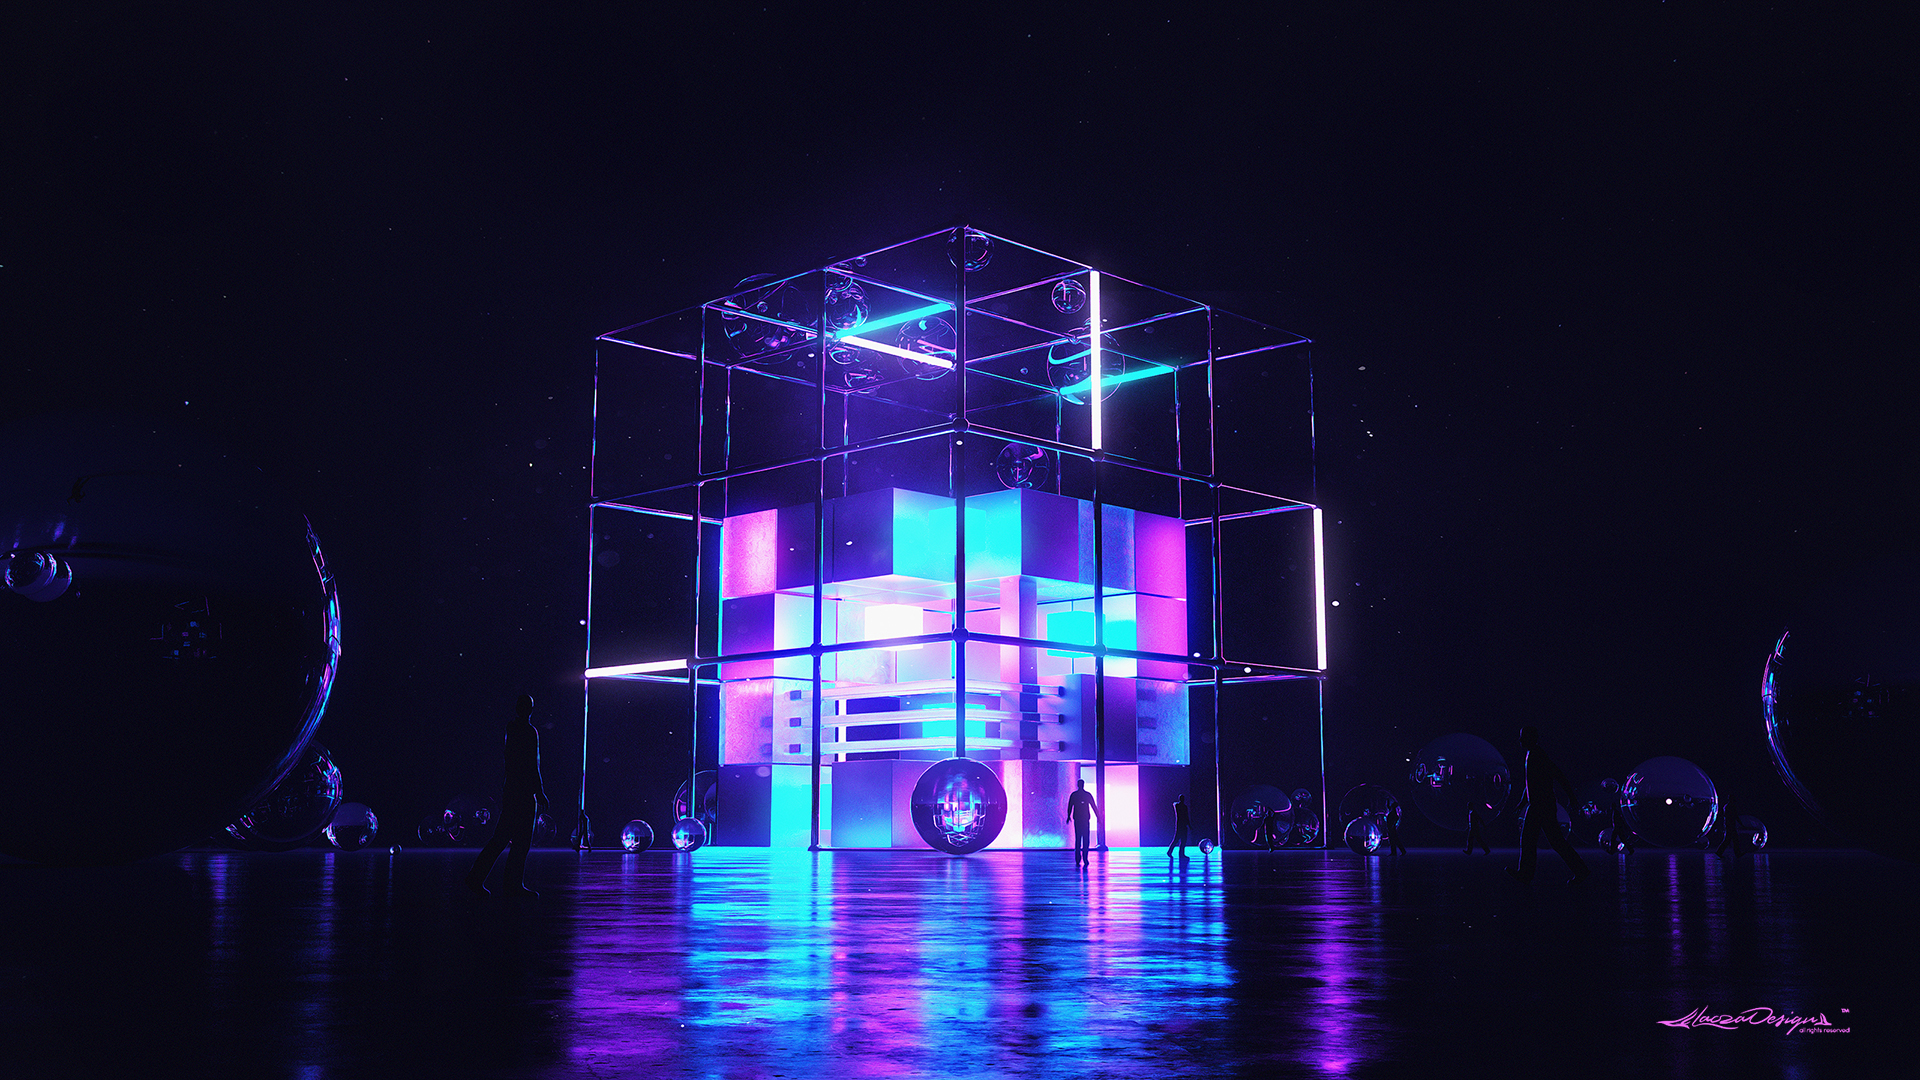 General 1920x1080 digital digital art artwork 3D night landscape architecture silhouette people sphere cube reflection lights neon neon lights glowing 3D Abstract abstract blue pink dark futuristic cyberpunk science fiction surreal cyan CGI 3D Blocks DeviantArt